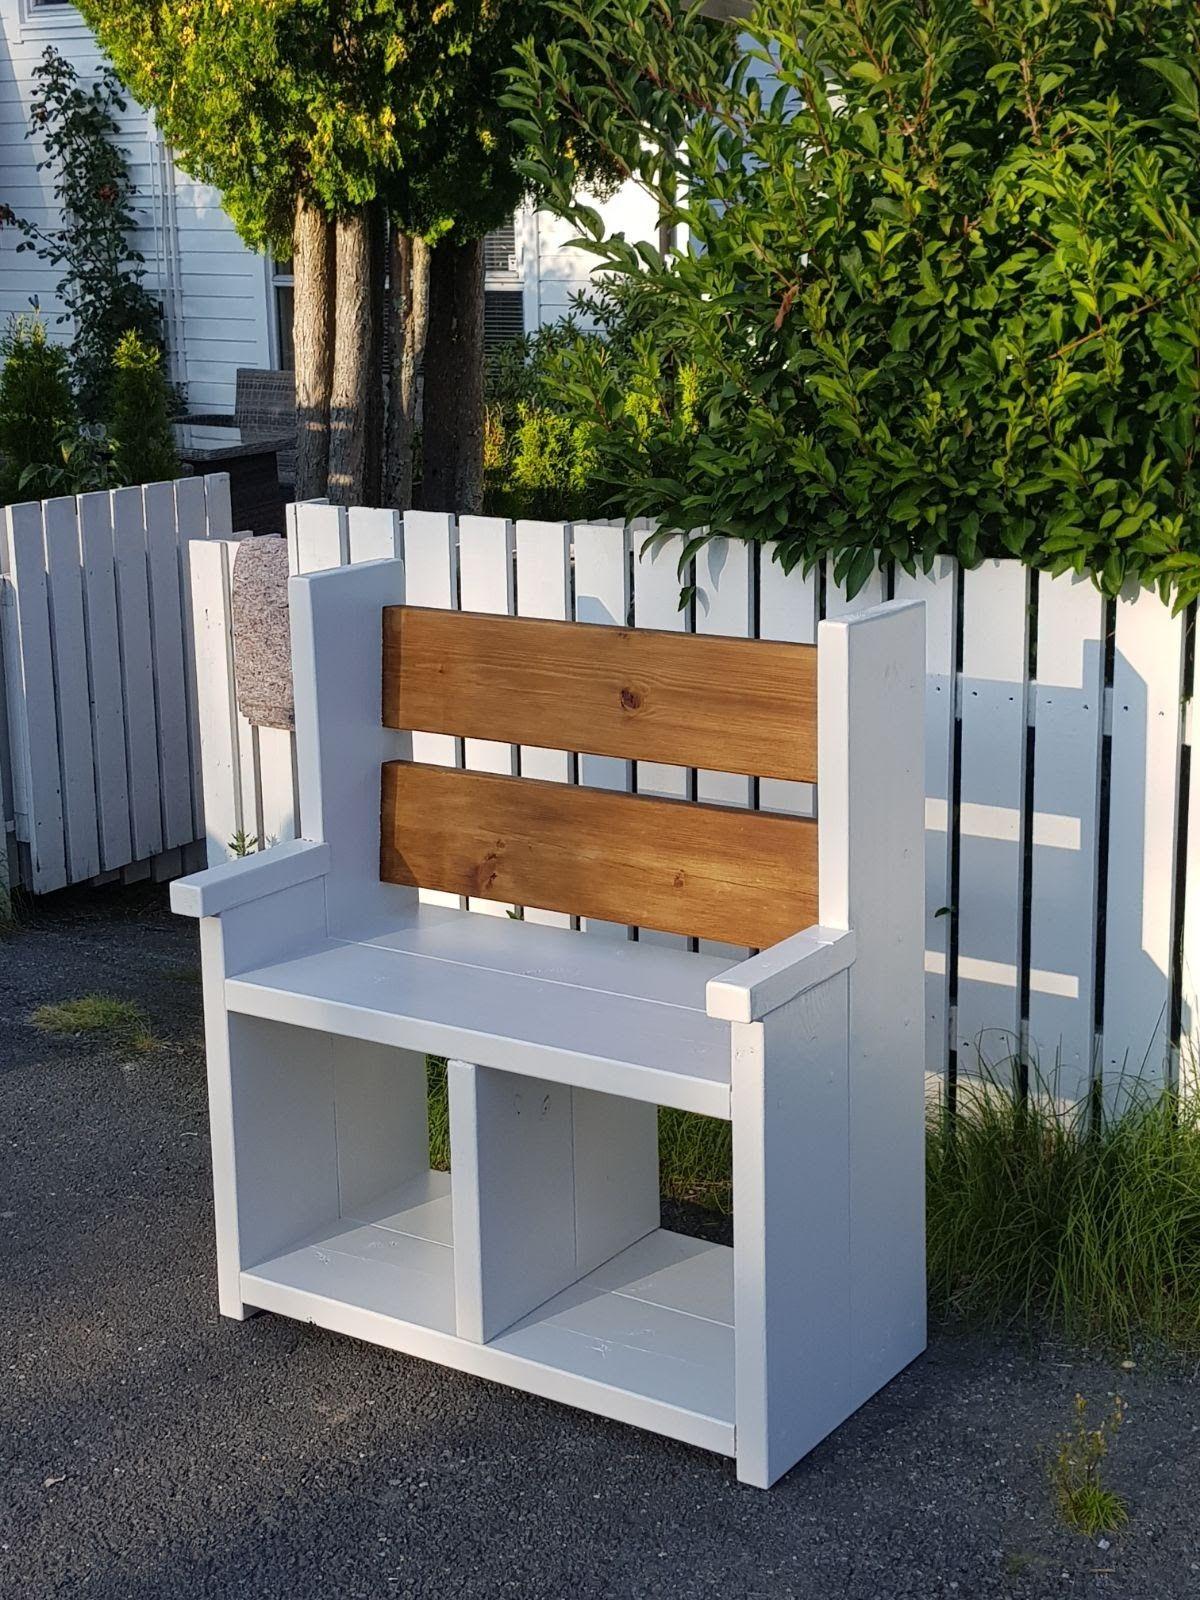 Hand made bench - Oslo  - Hand made bench - Oslo